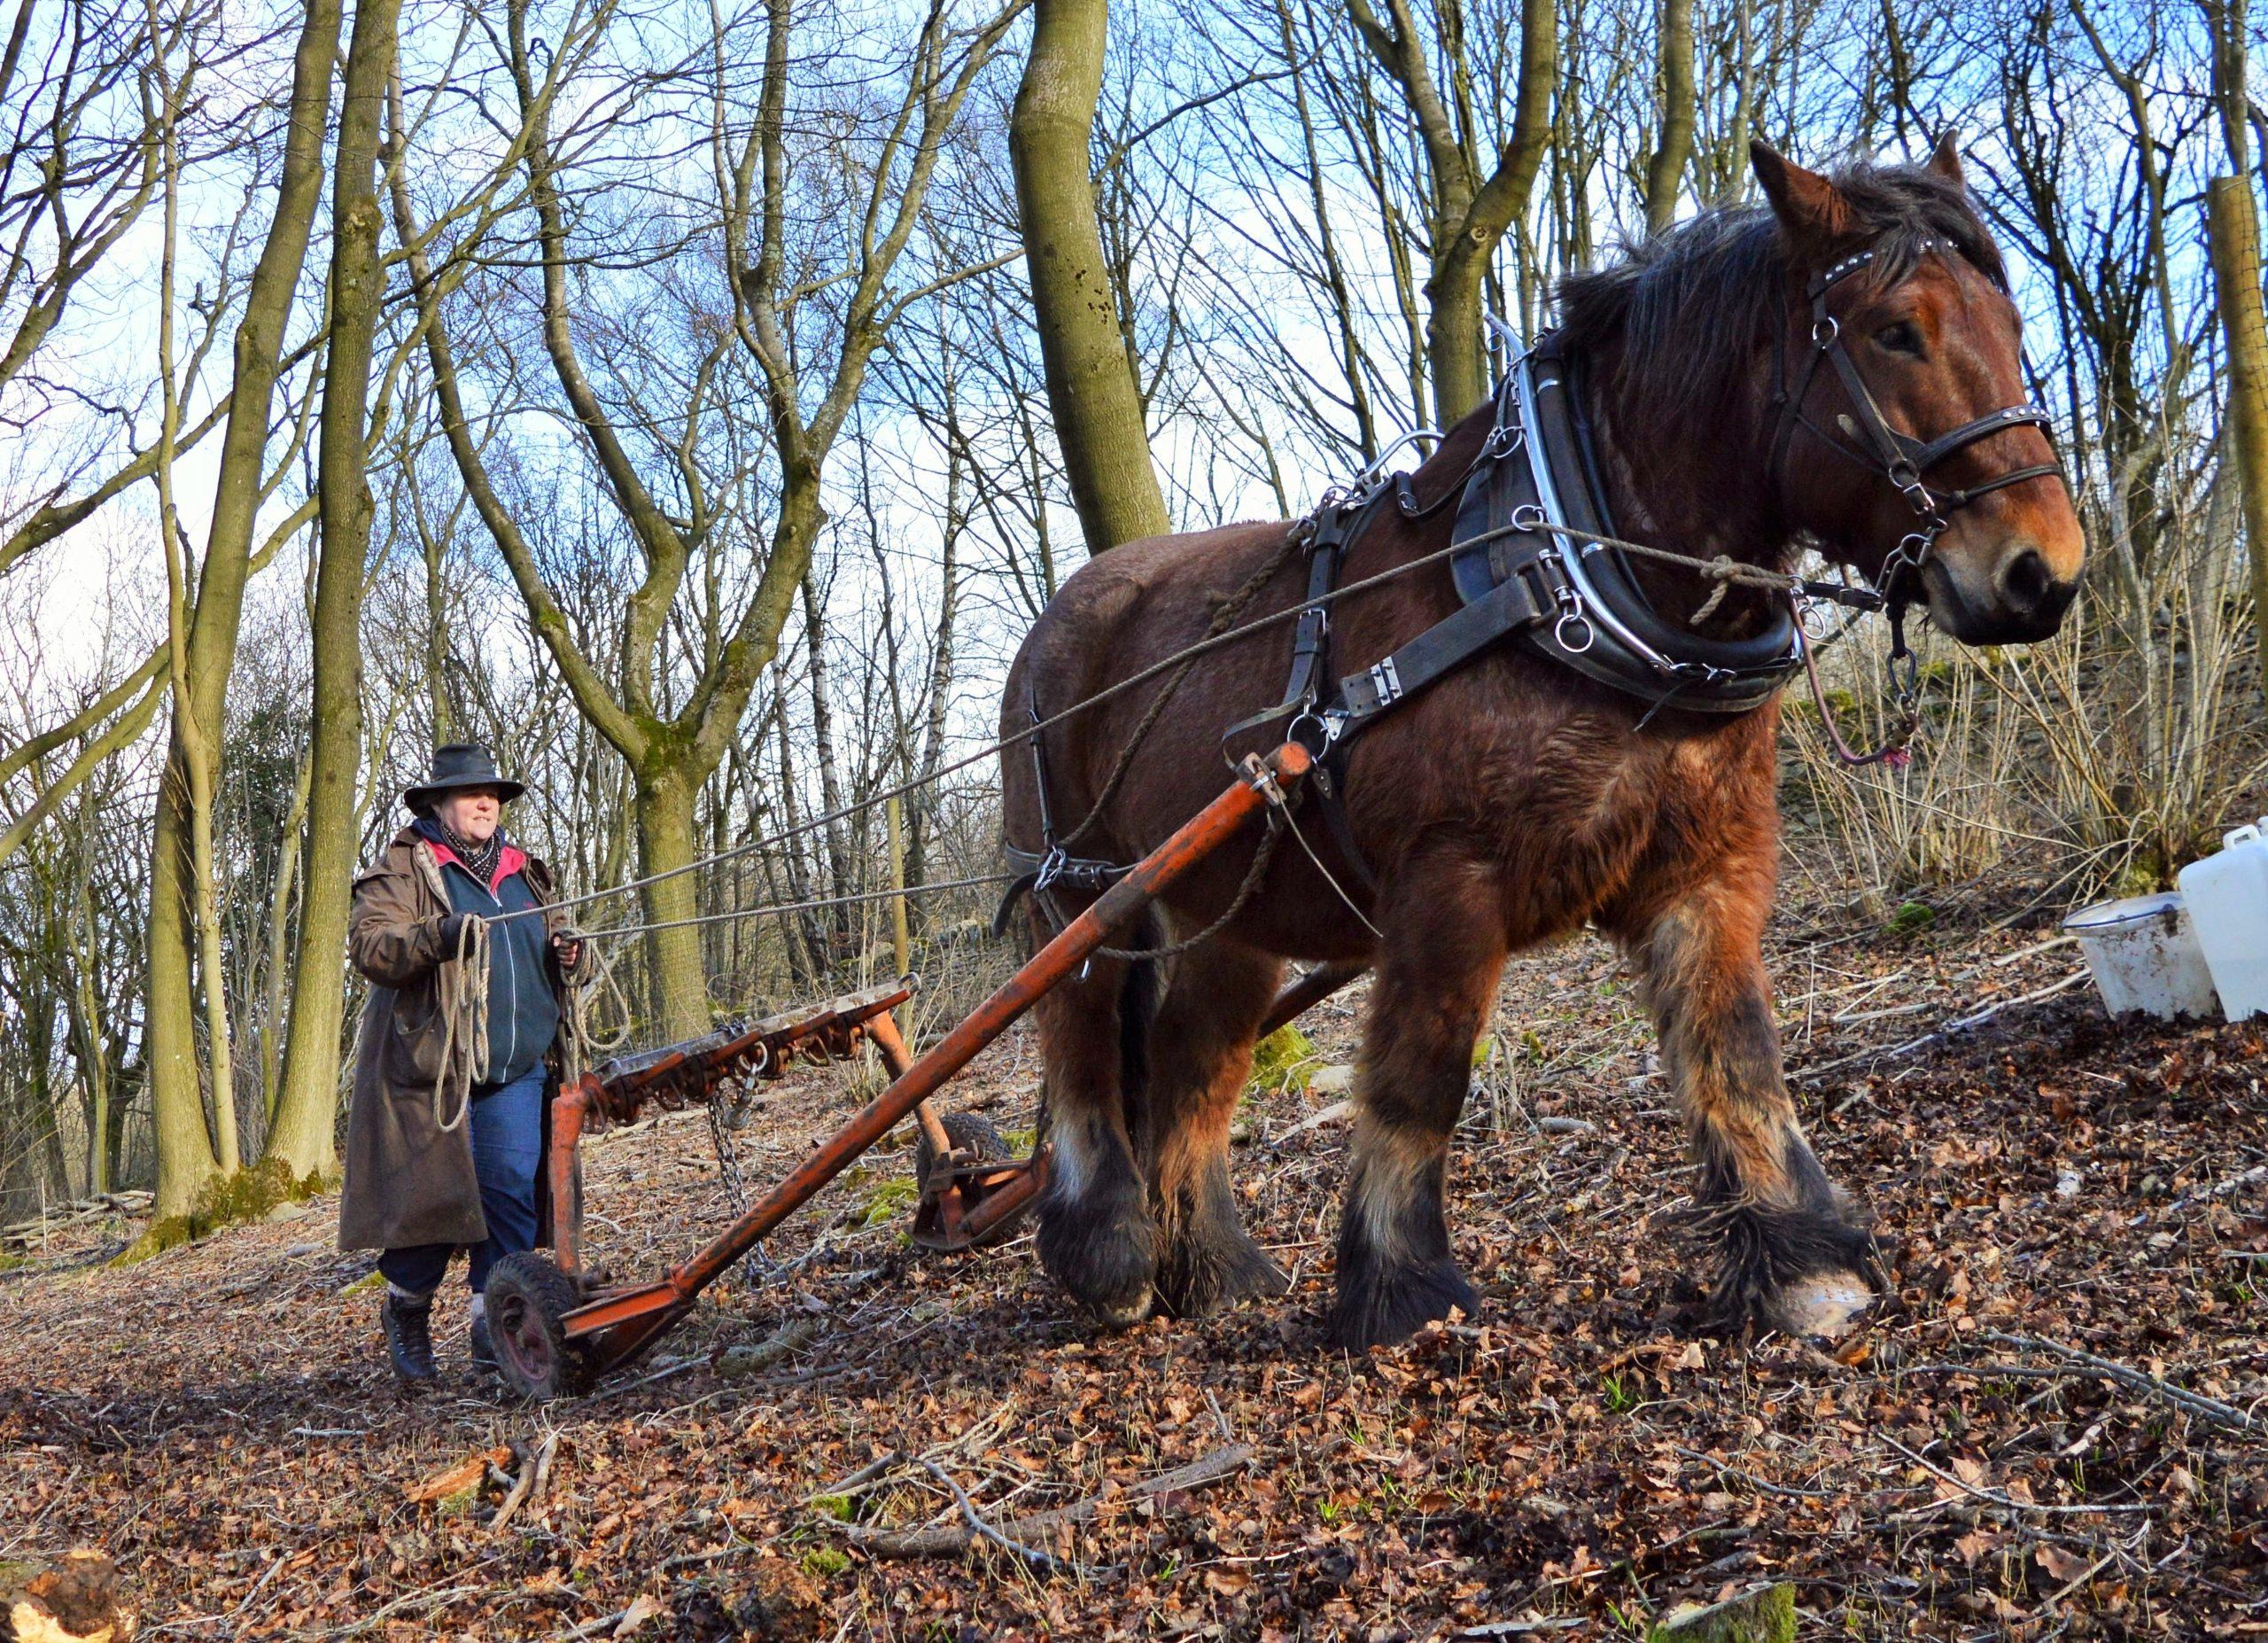 A woman horselogging